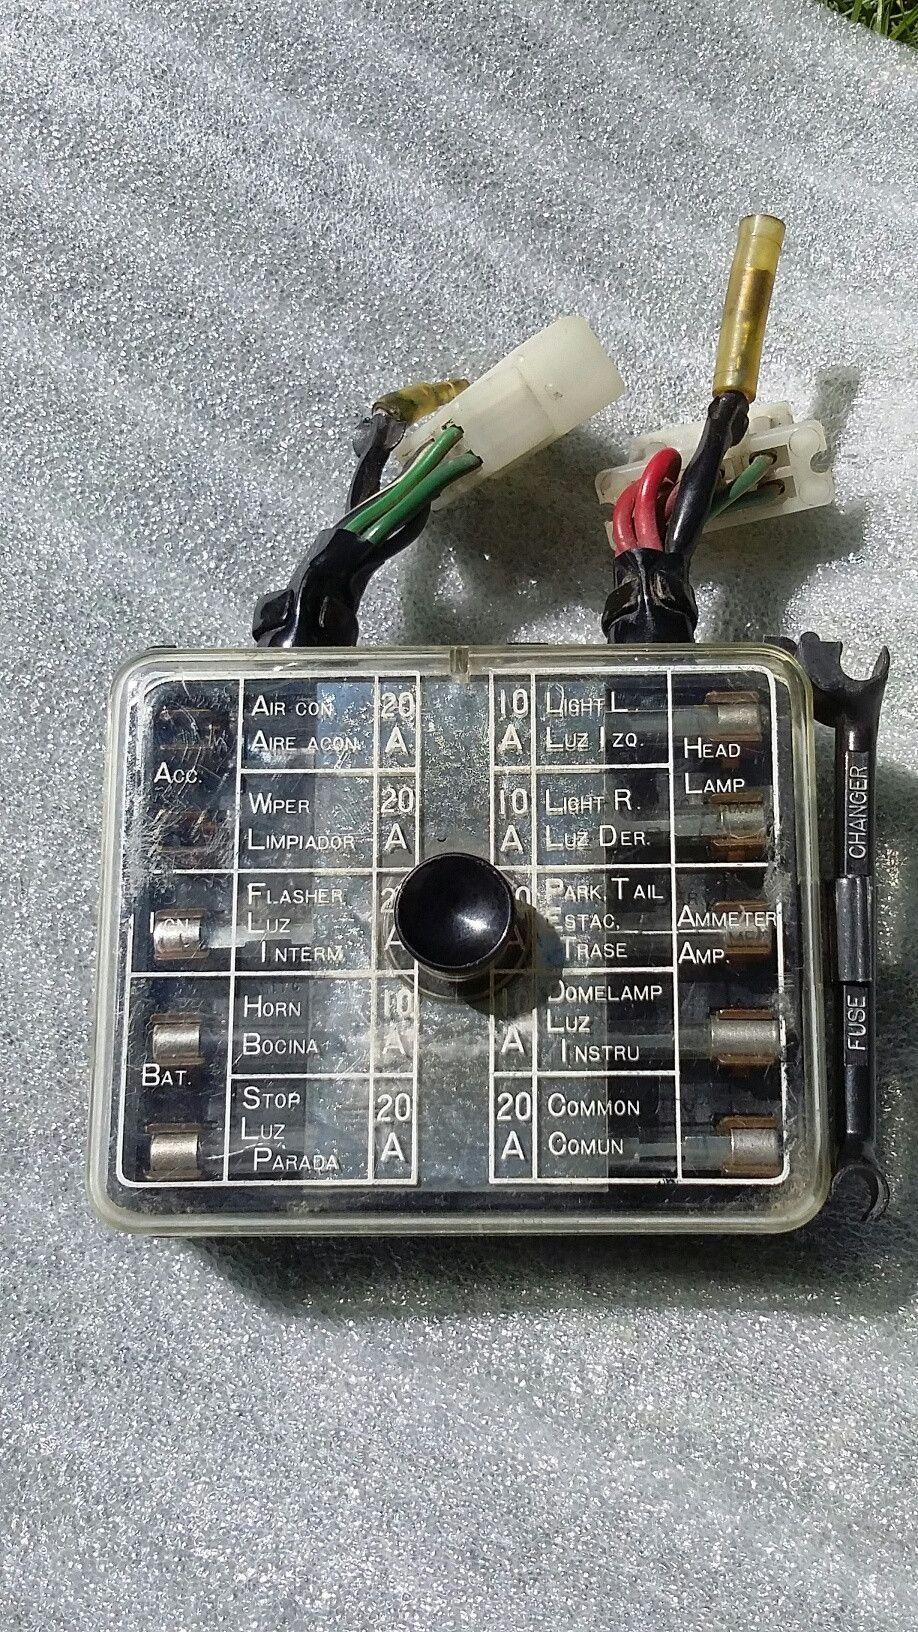 1972 1973 datsun 240z fuse box pinterest products rh pinterest com